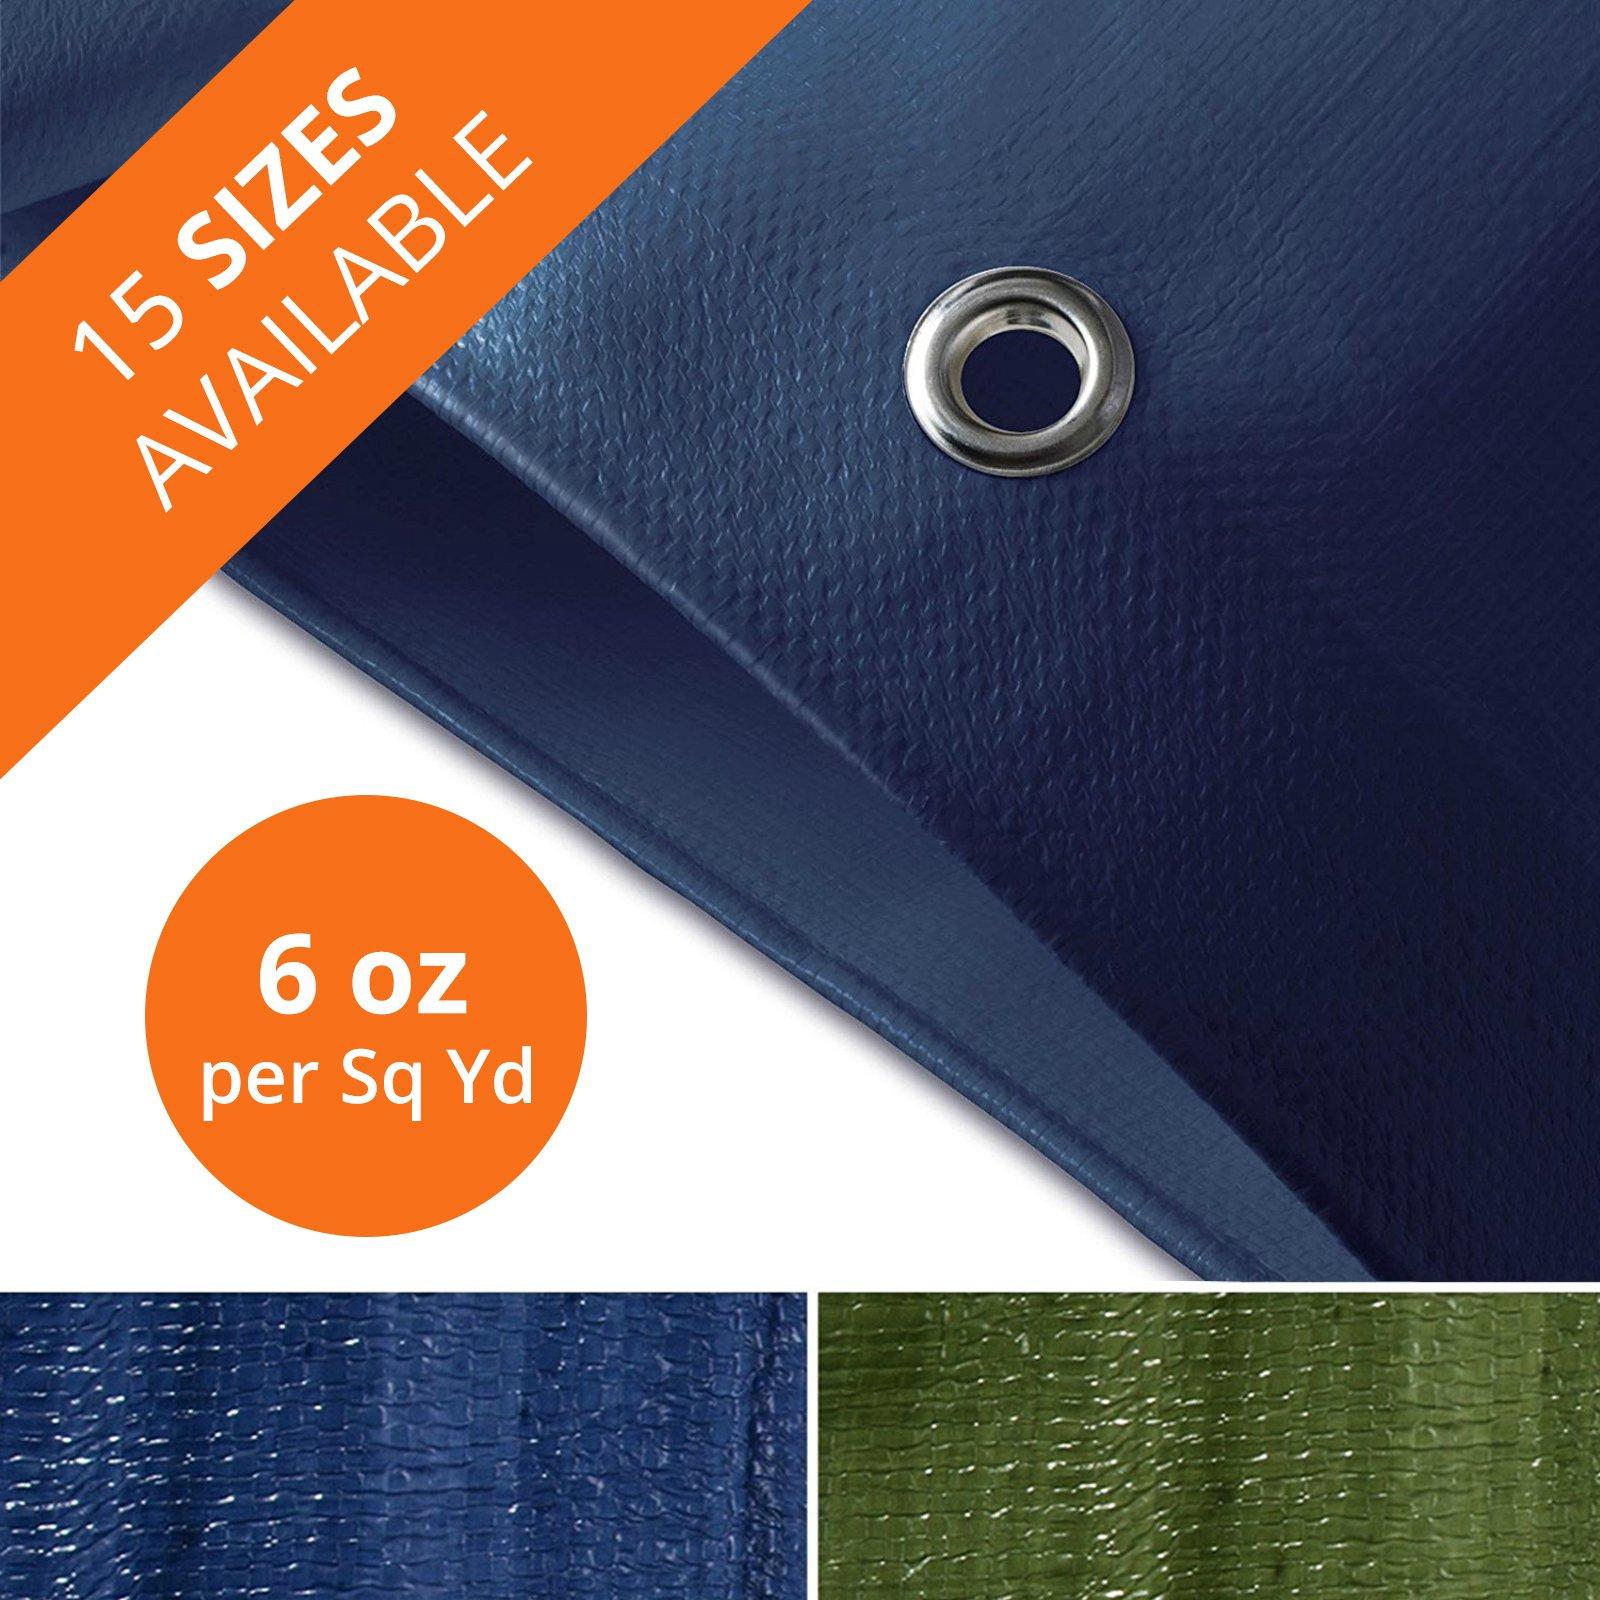 Tarps Medium Duty Waterproof | Ground Tent Trailer Cover | Large Tarpaulin in Multiple Sizes | 6 oz/Sq Yd | Blue - 10' x 12'